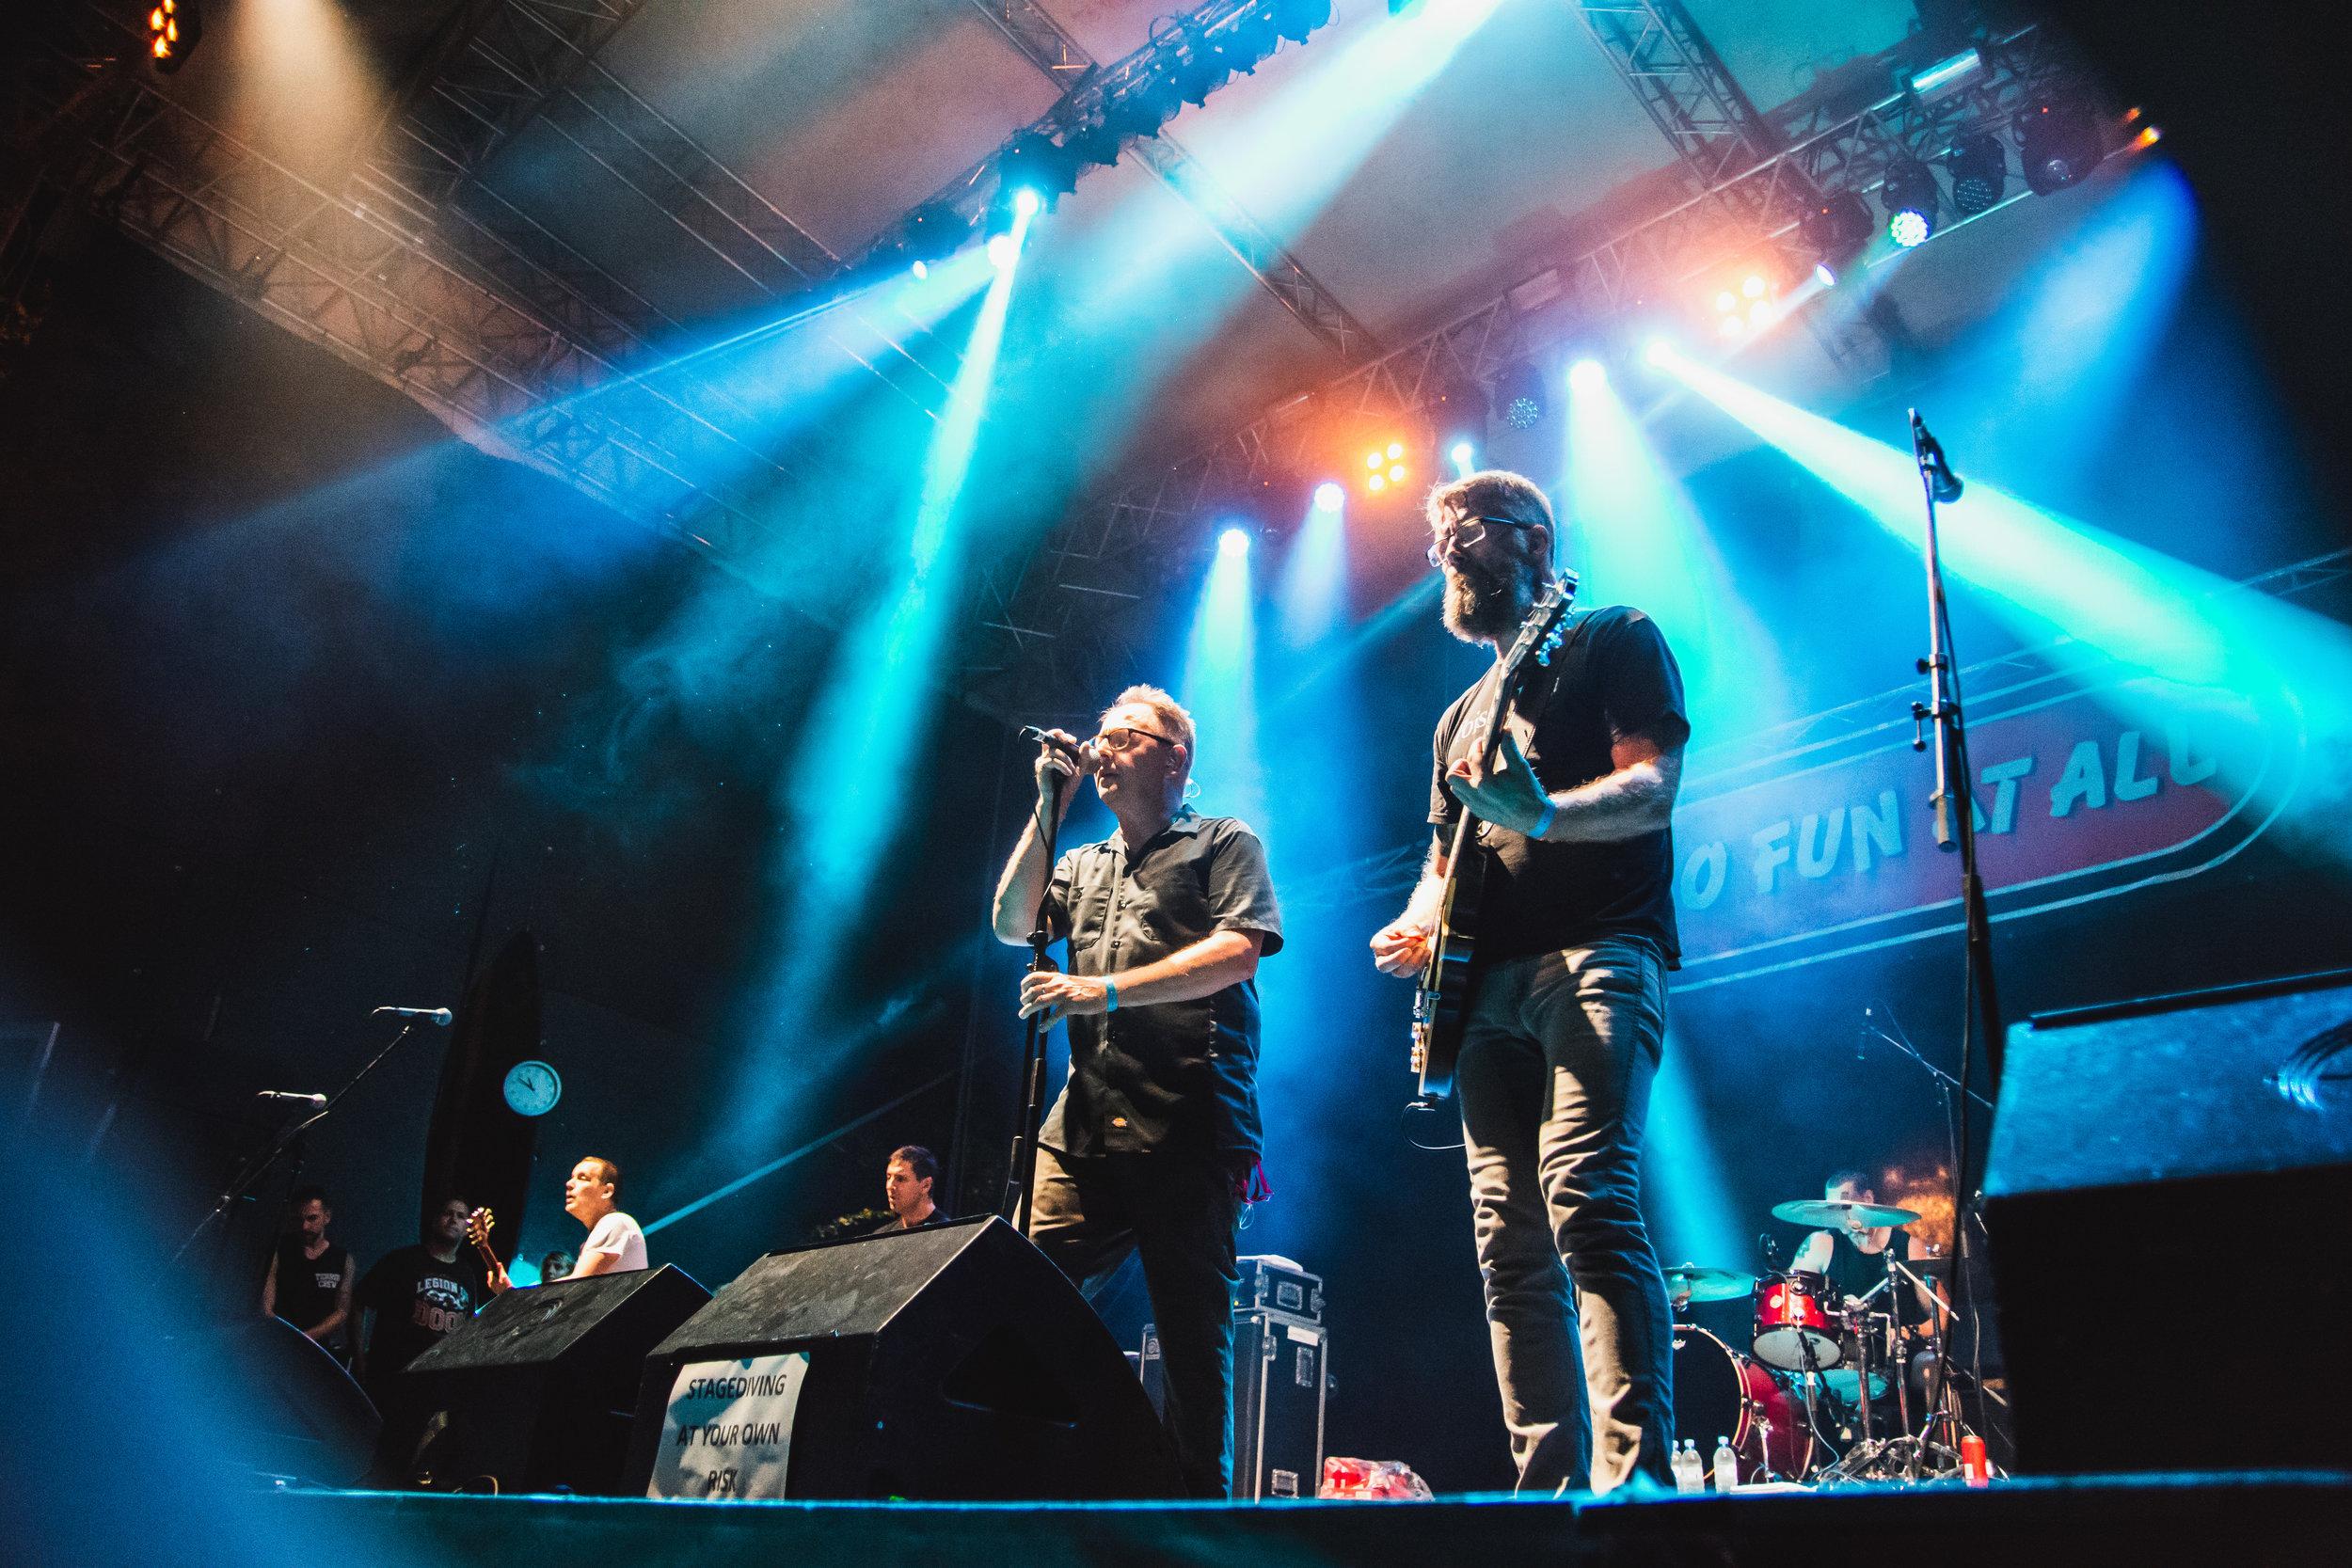 Punk-Rock-Holiday-Tuesday-No-Fun-At-All_10_2018August 07, 2018.jpg